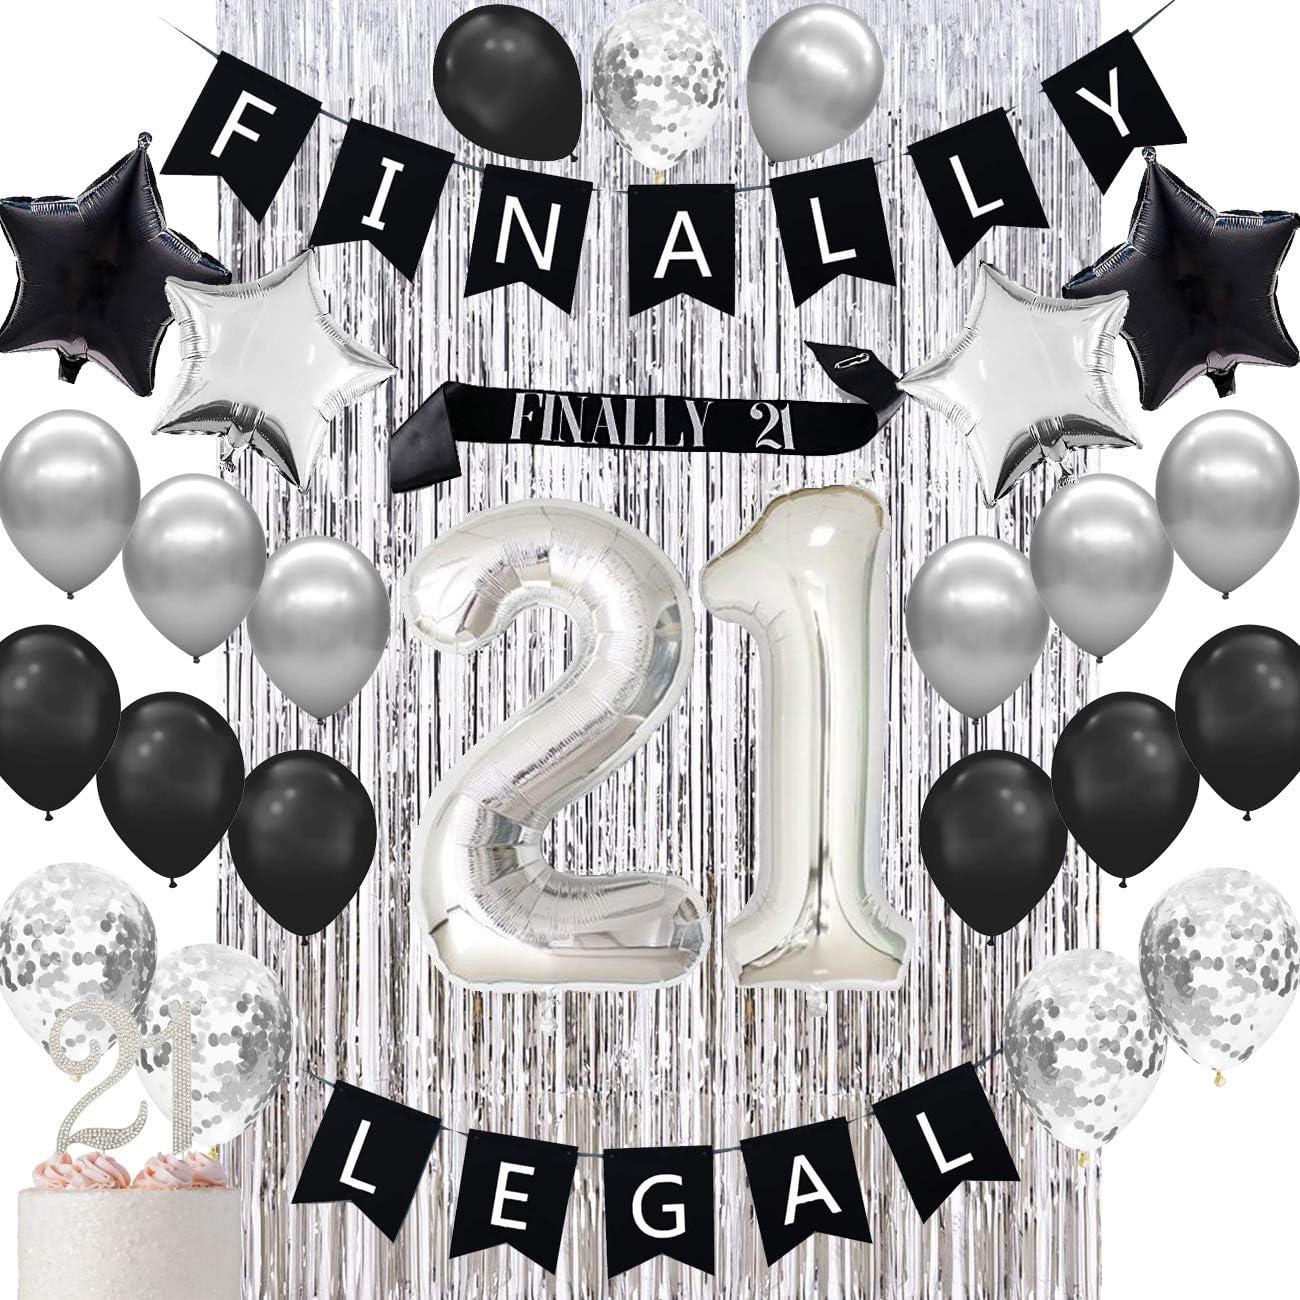 Amazon Com Haimimall 21st Birthday Decorations 21st Birthday Balloons Finally 21 Birthday Banner 21st Birthday Sash Health Personal Care